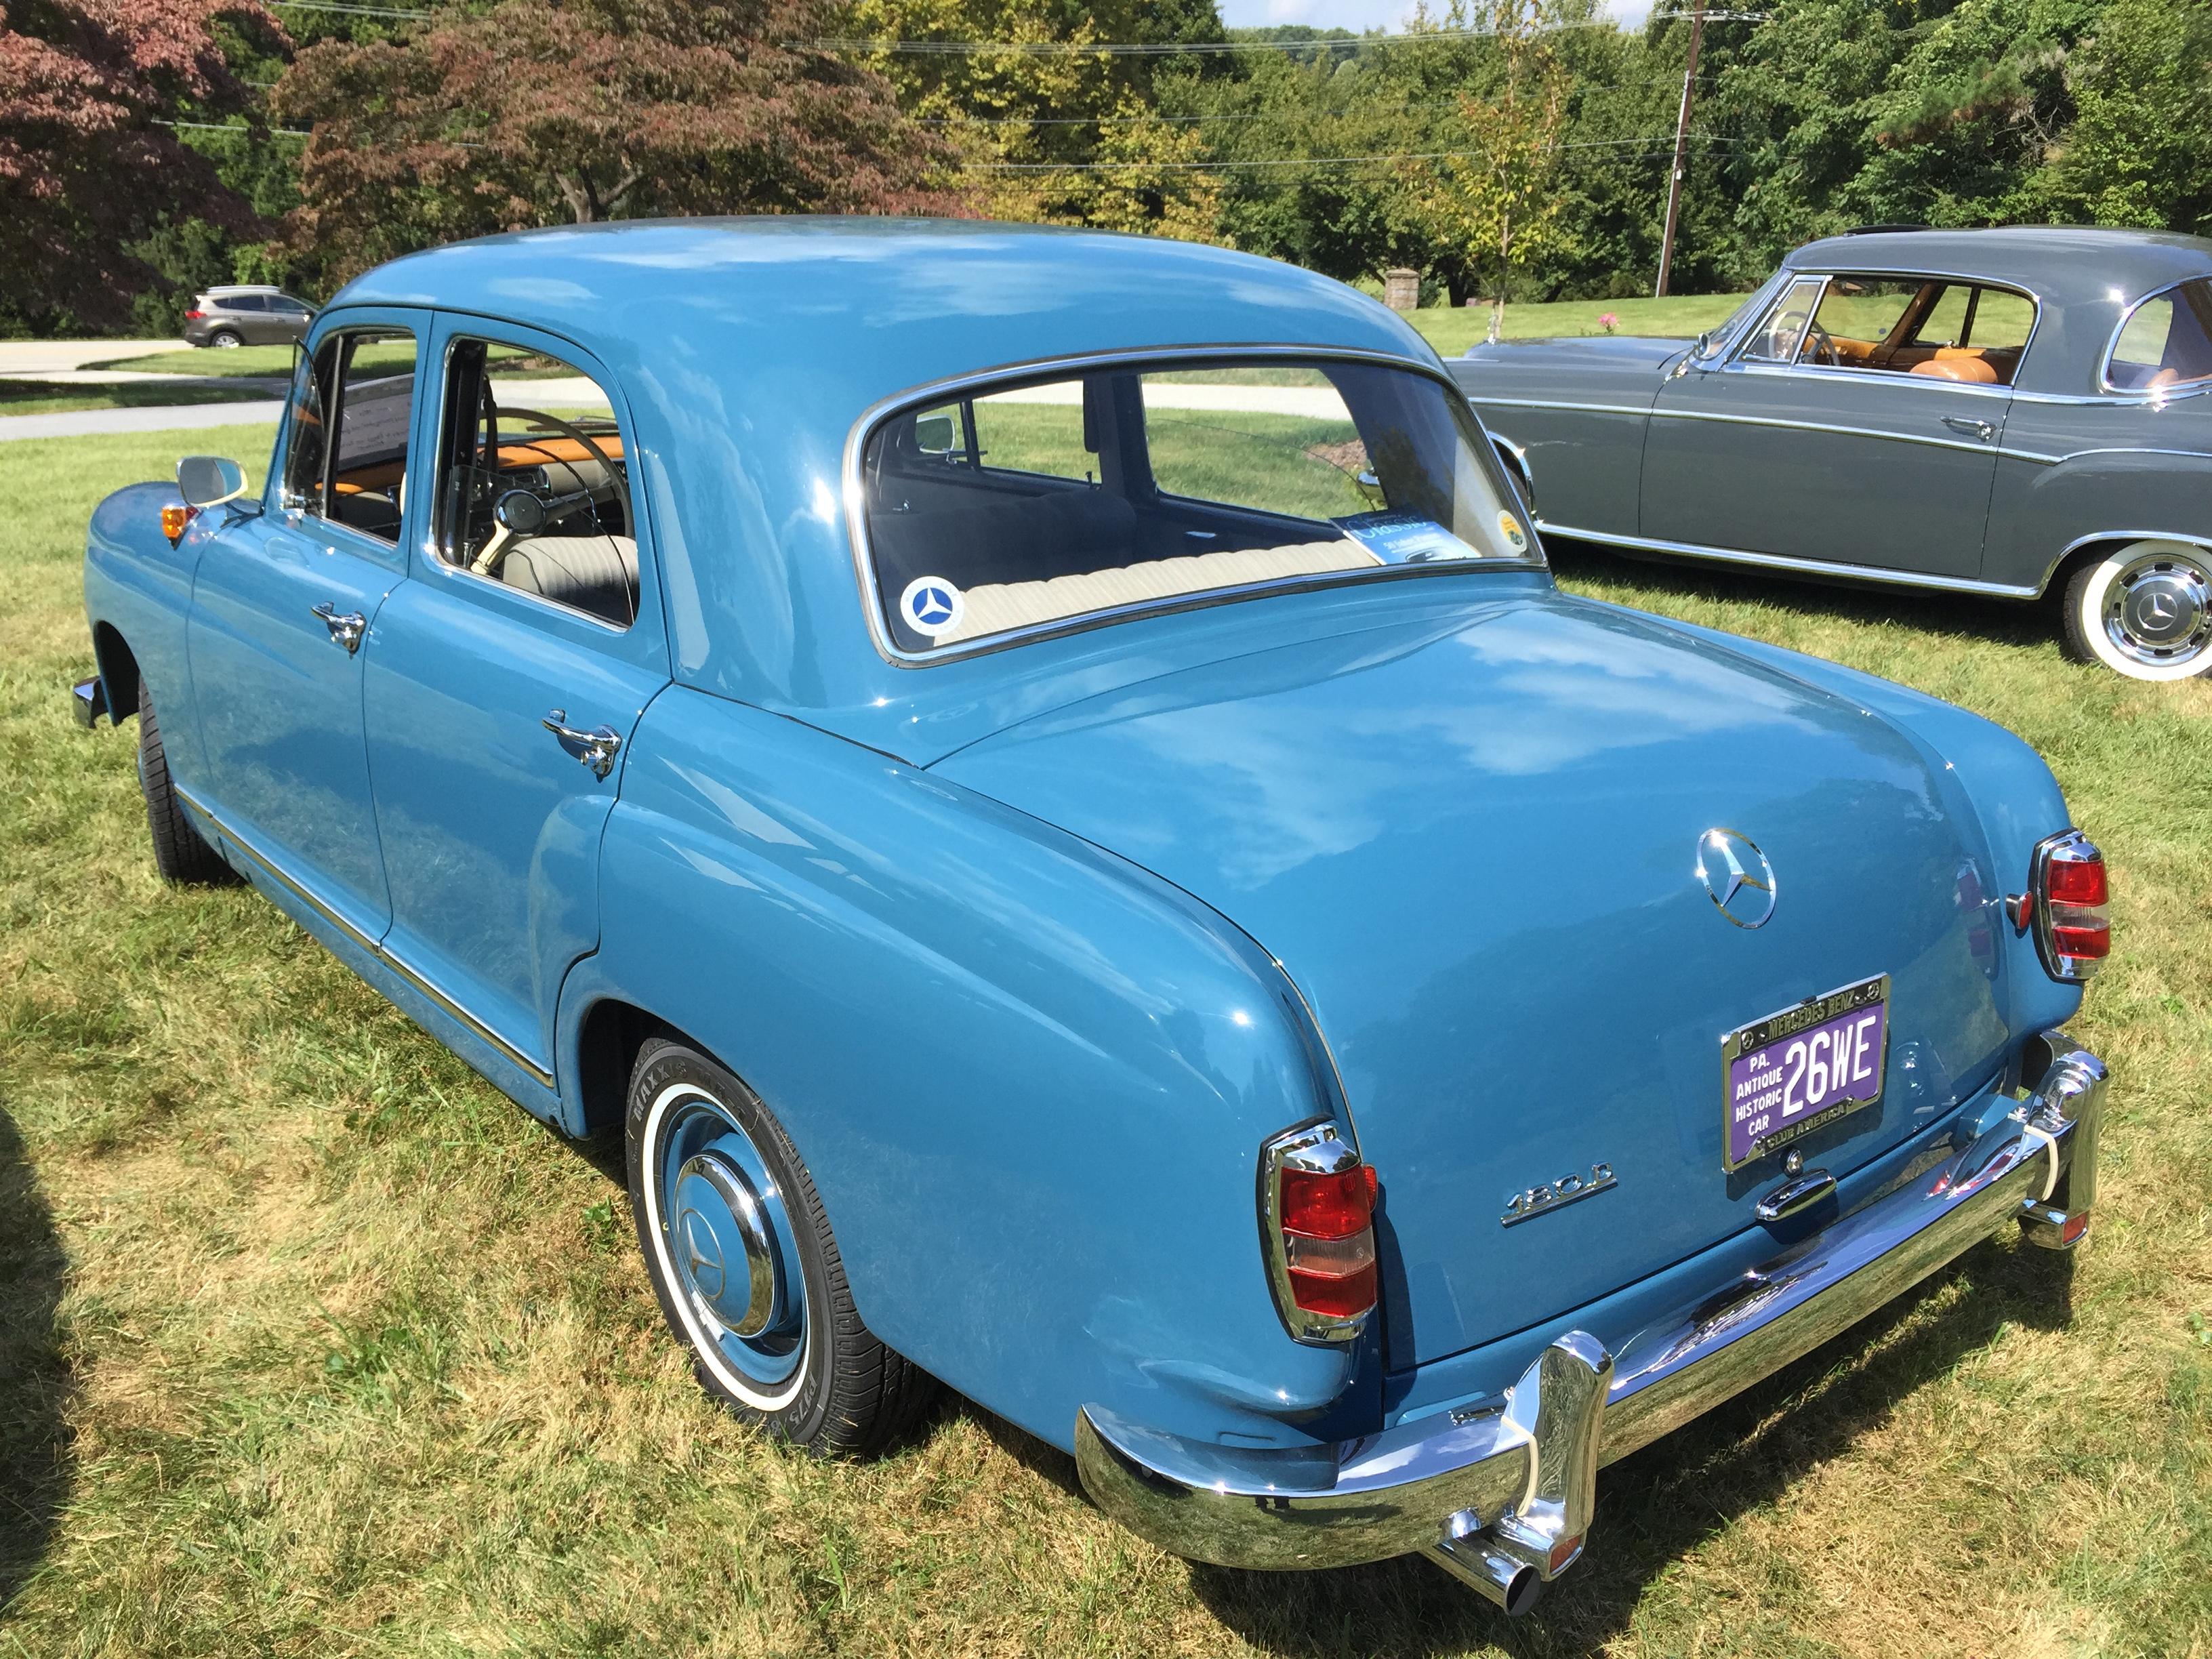 Mardy von harten 39 s 1958 mercedes benz 180d ponton sedan for Mercedes benz 180d for sale